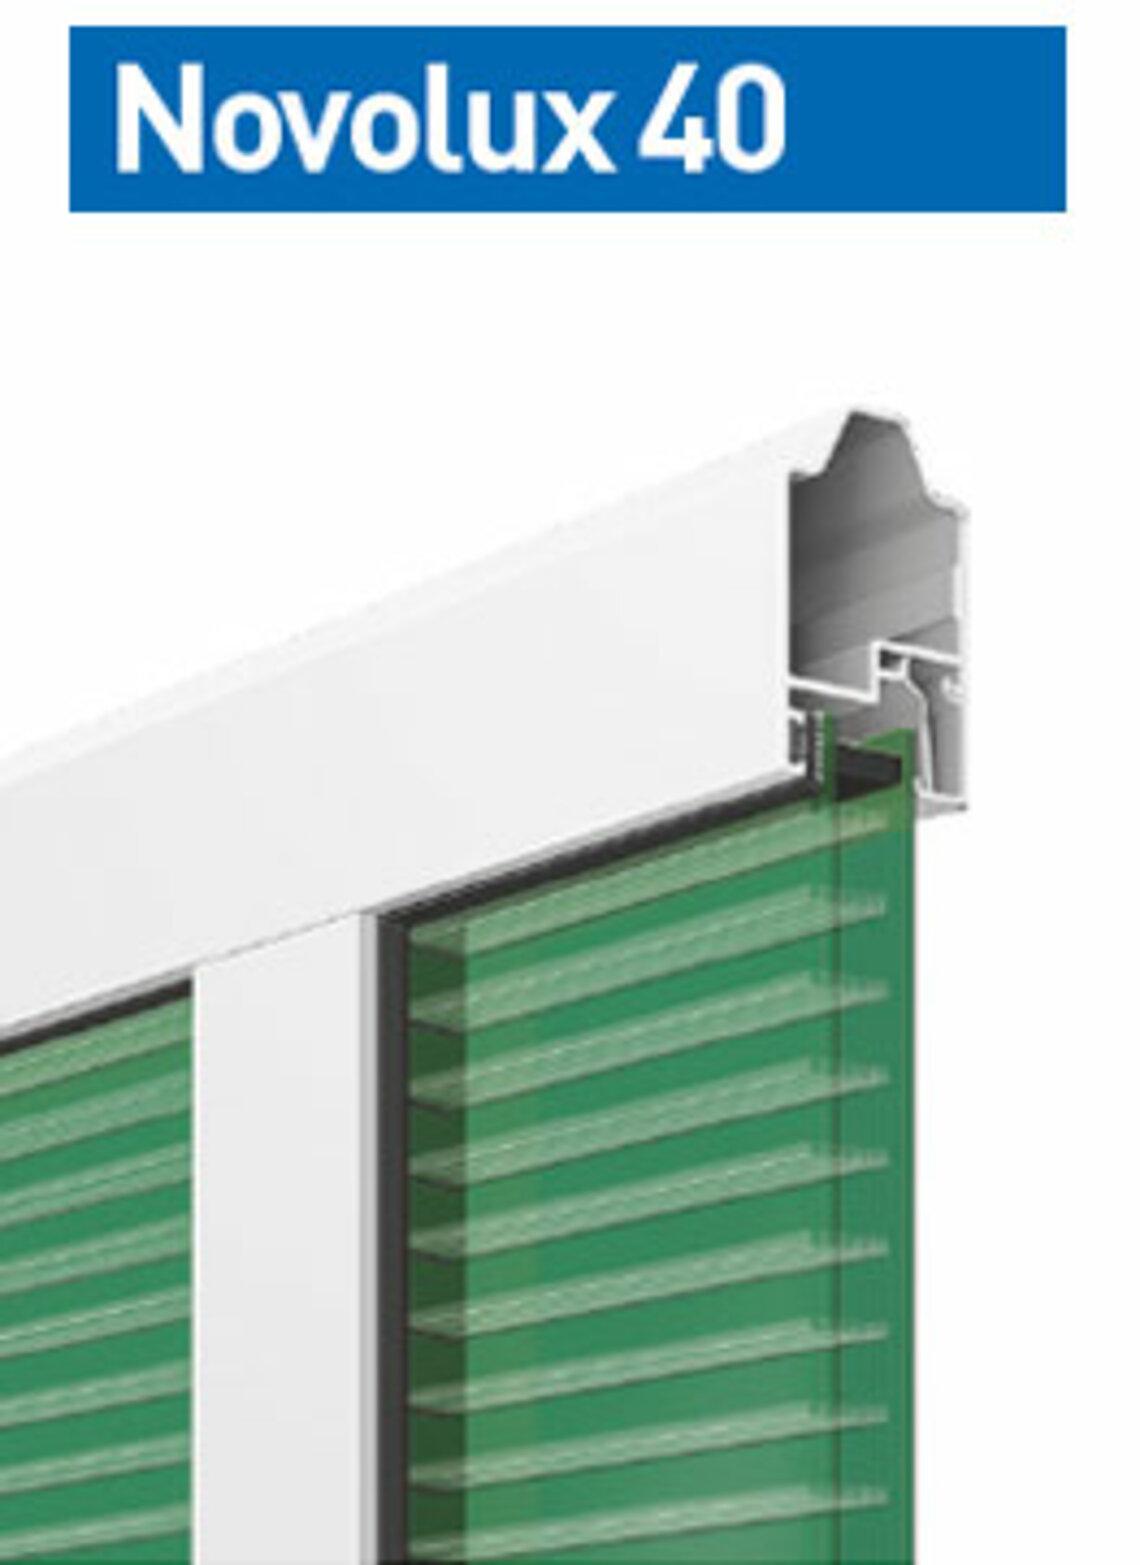 Novolux 40  20 mm: zielony